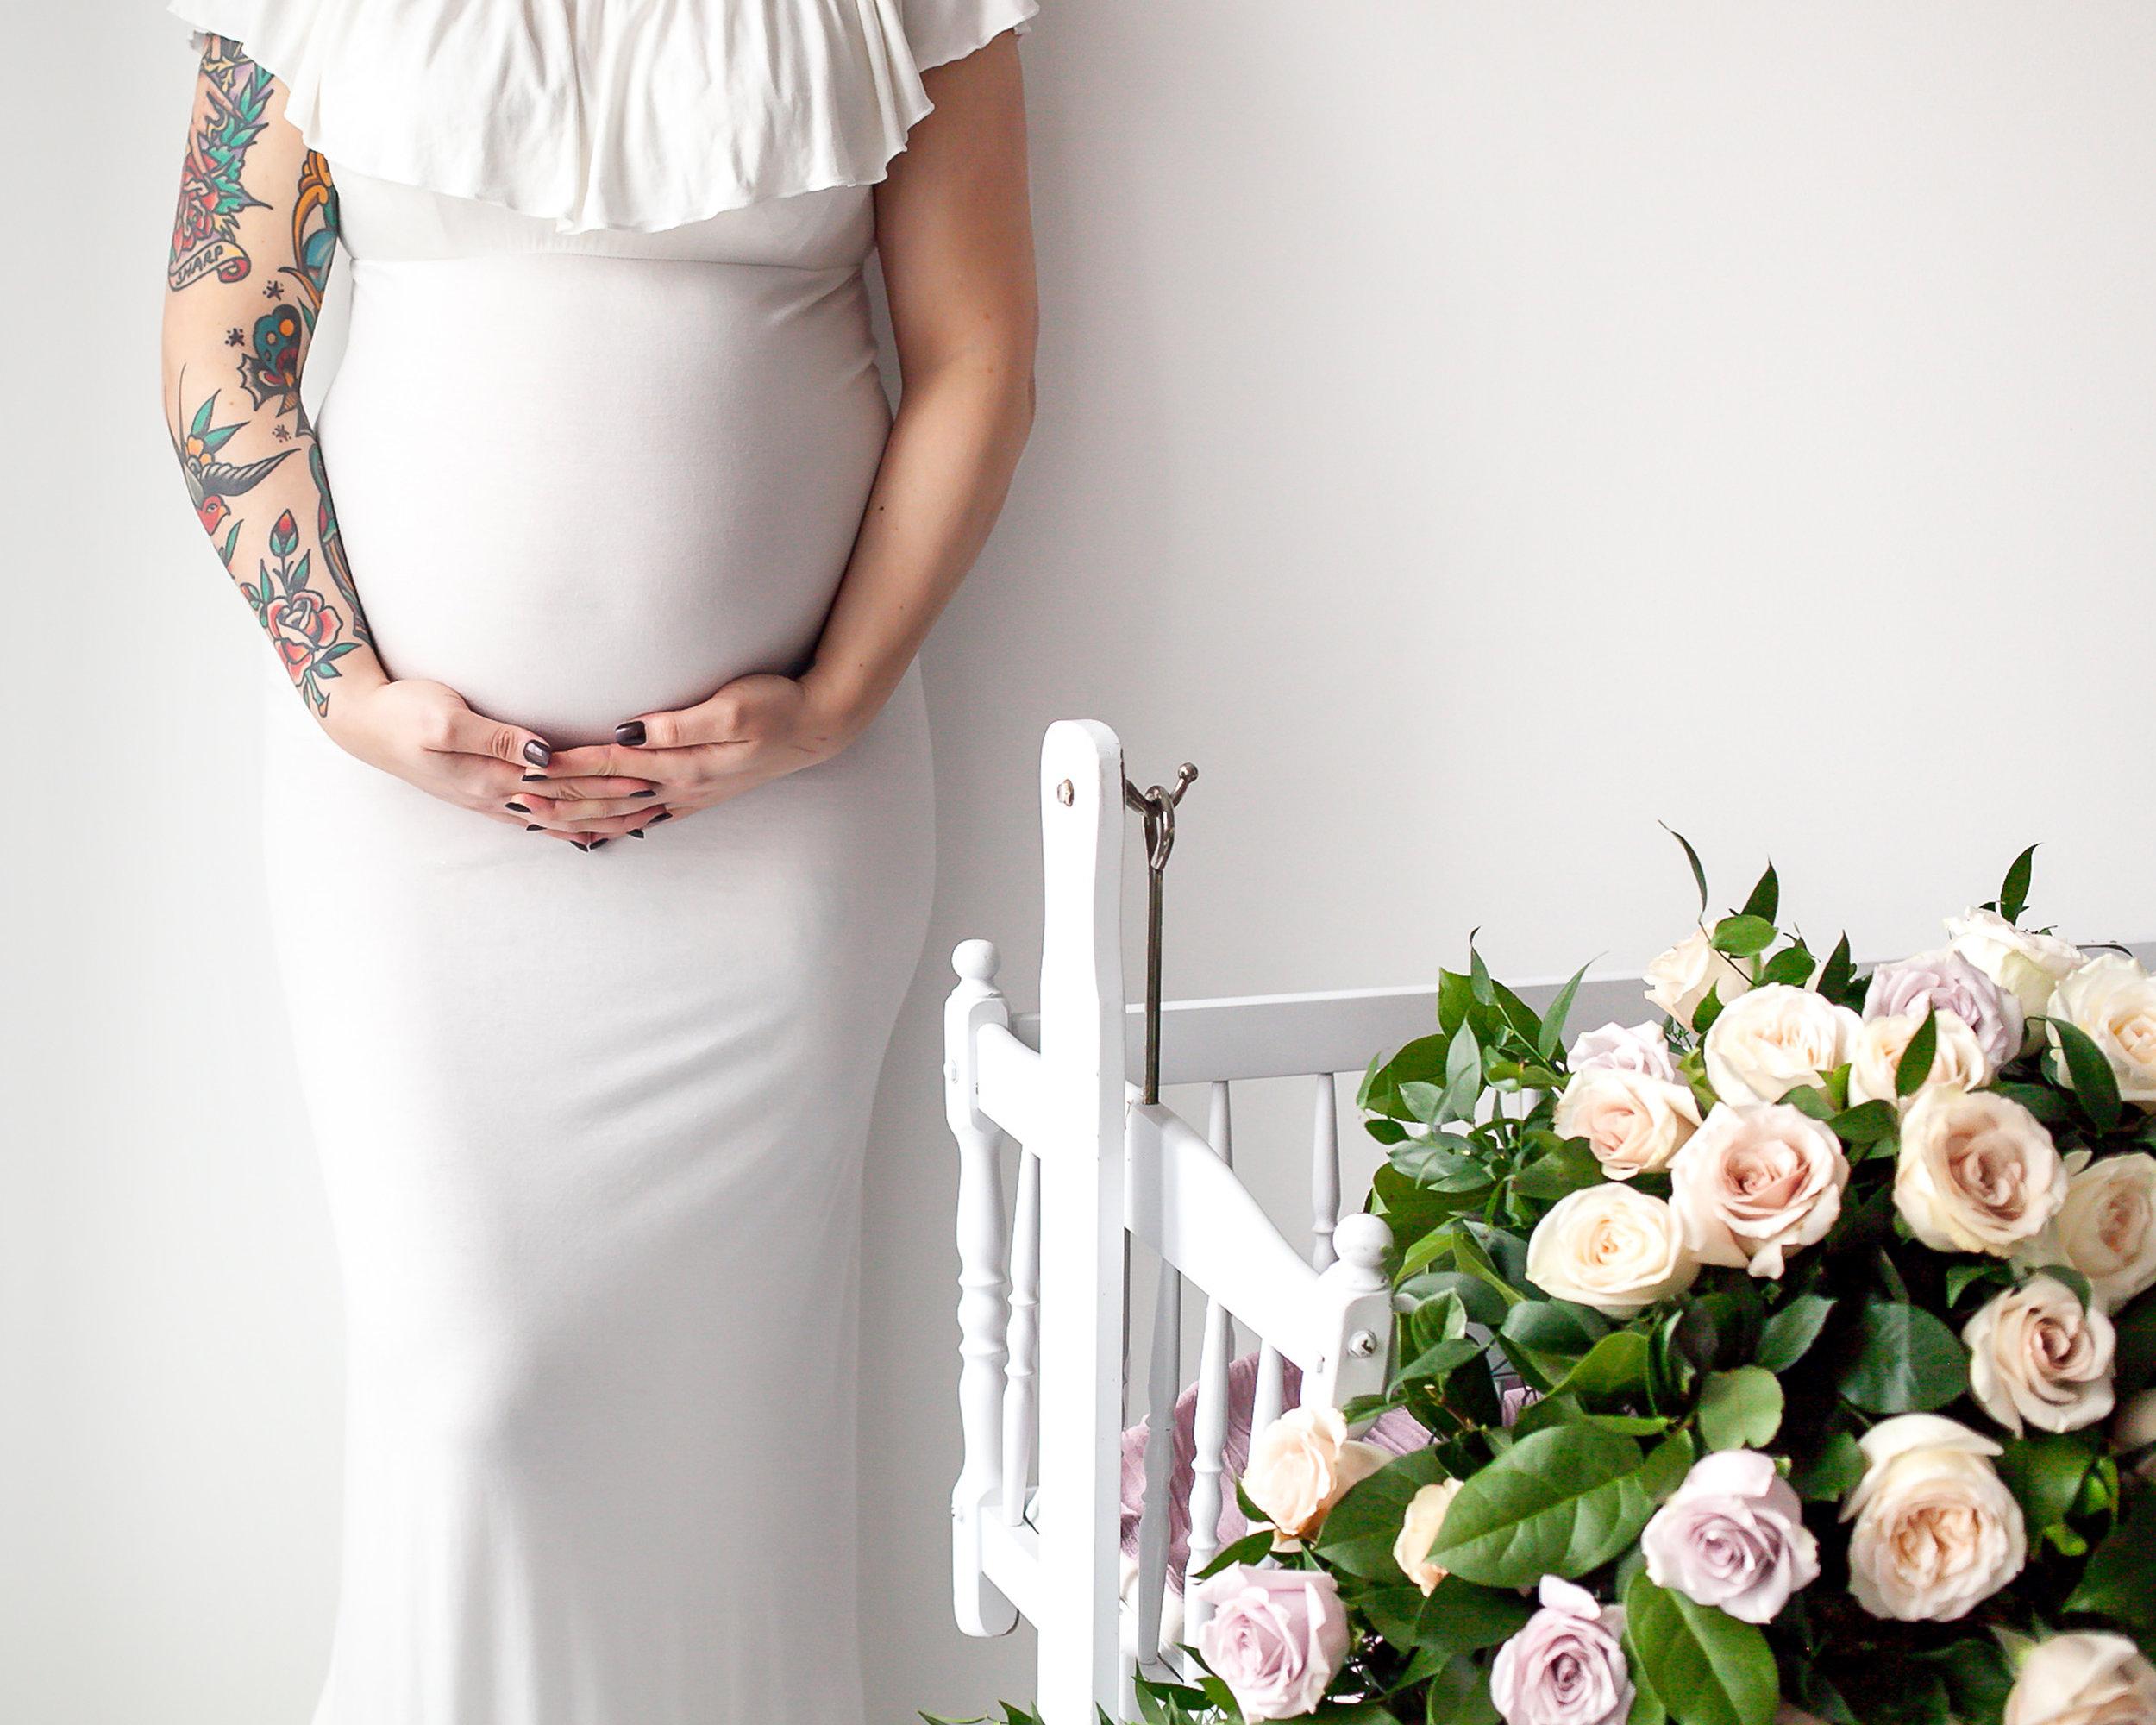 Floral_Maternity_Oshawa_Durham Region_Toronto_Petra_King_Photography